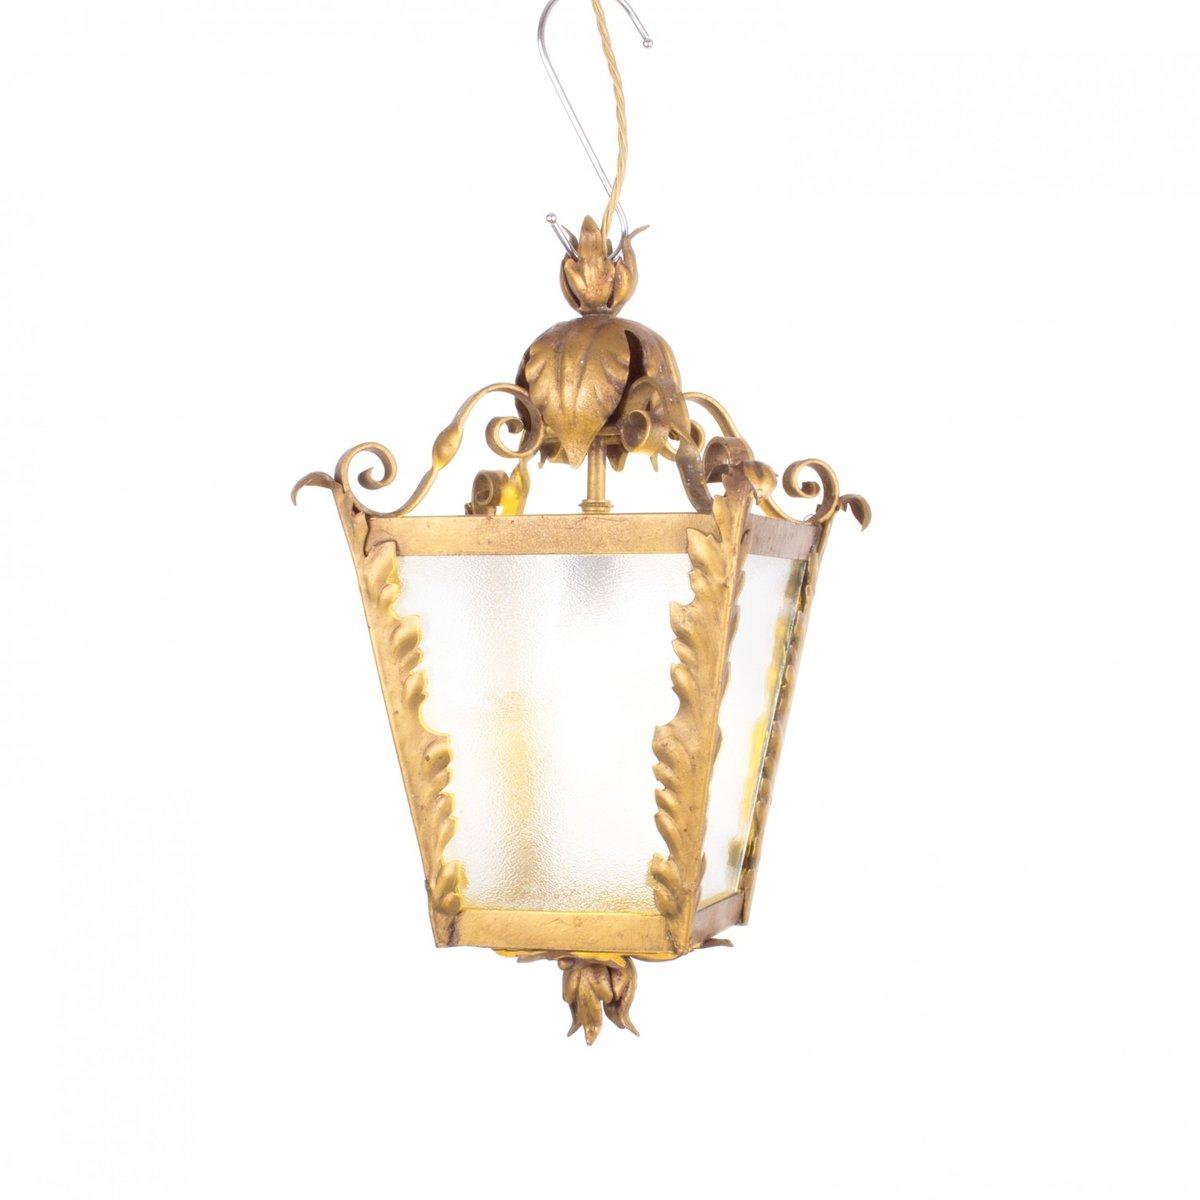 Vintage Laterne aus Vergoldetem Metall & Glas